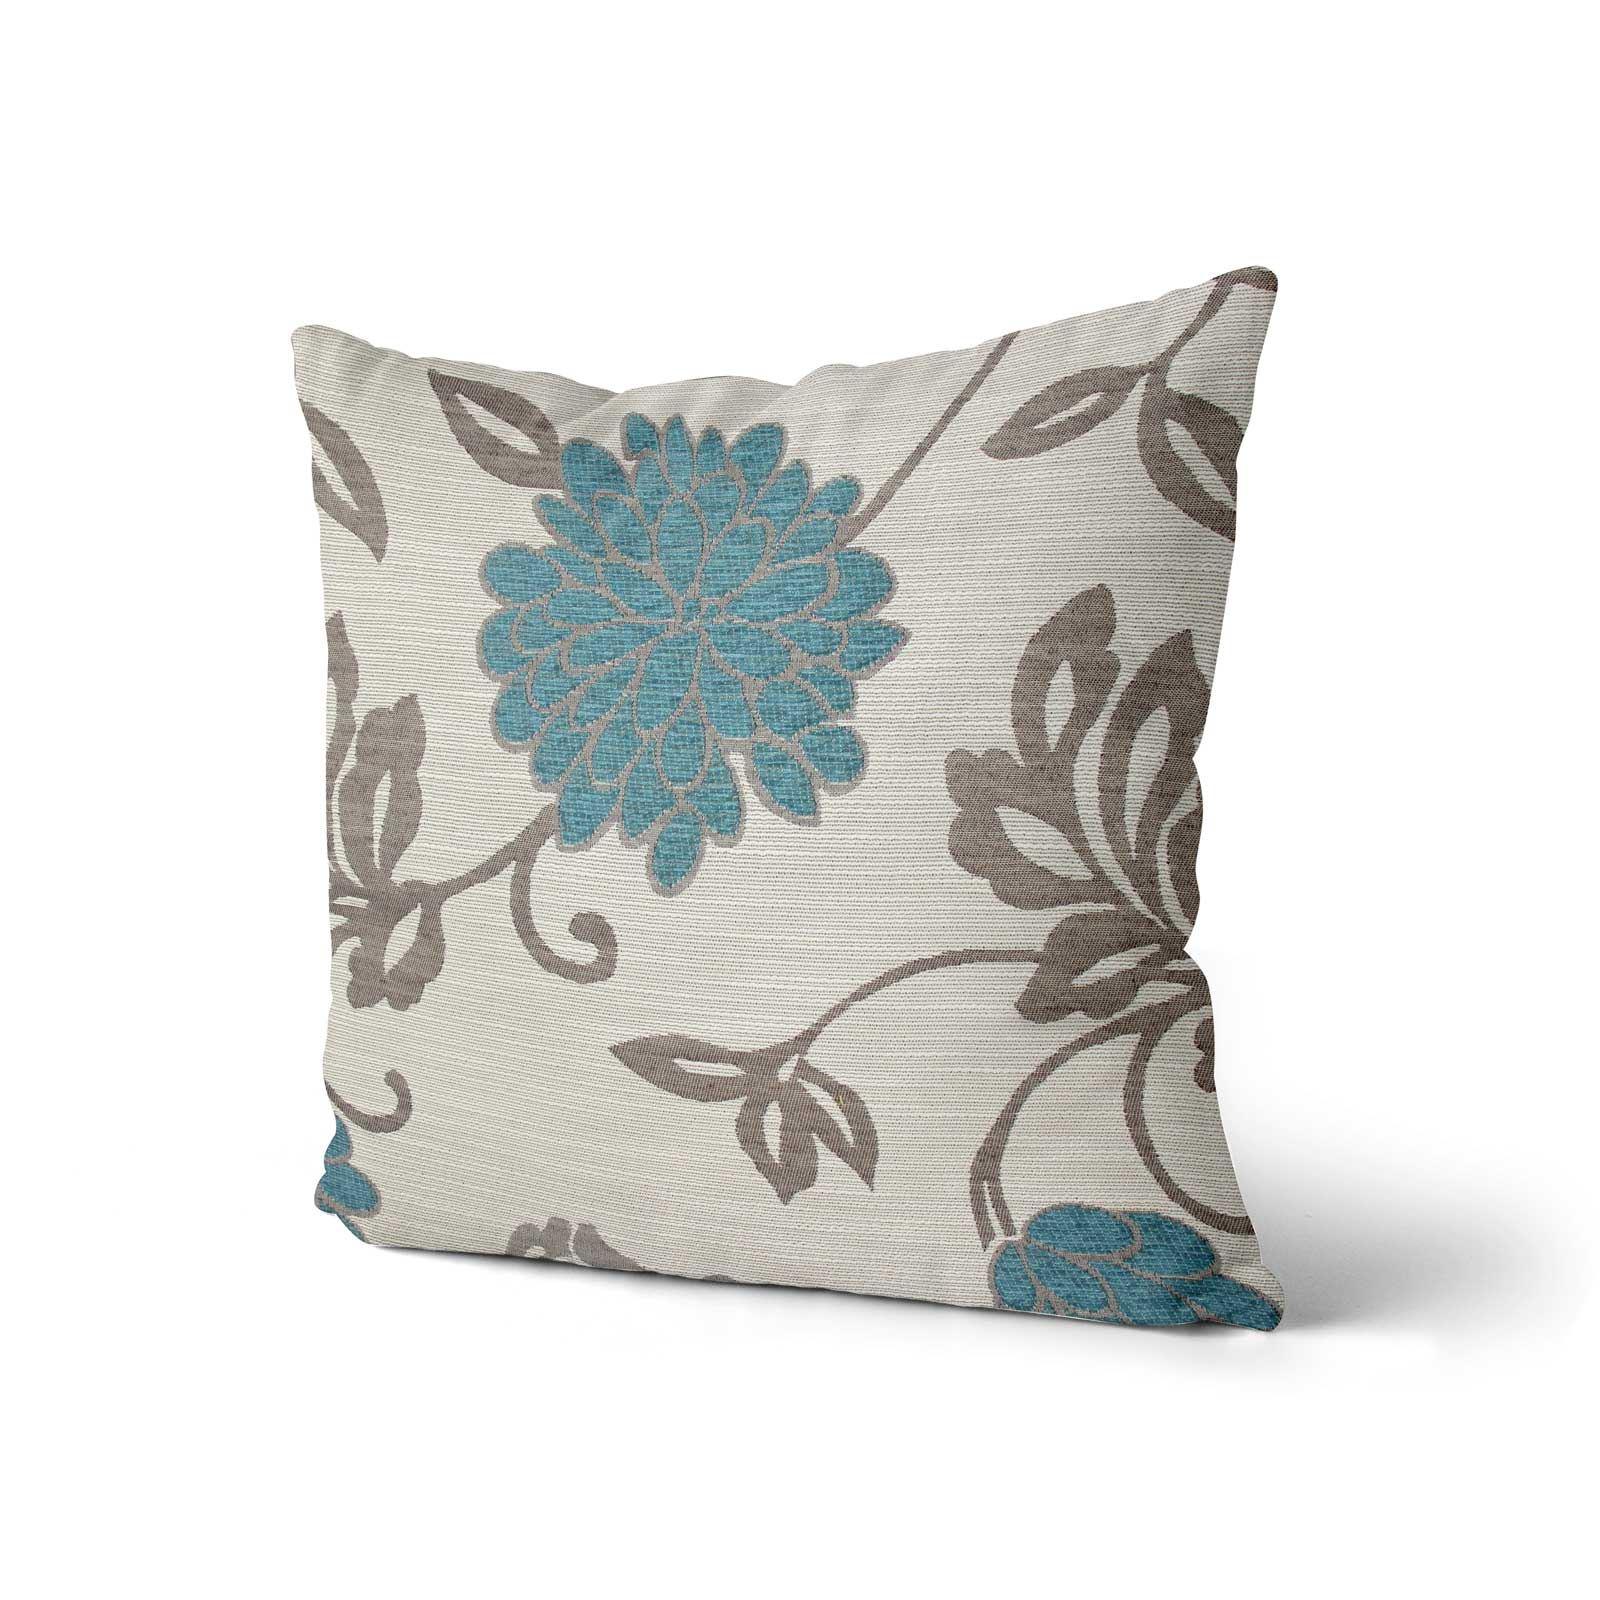 Teal-Blue-Duck-Egg-Cushion-Covers-18-034-x18-034-45cm-x-45cm-Luxury-Cover thumbnail 23